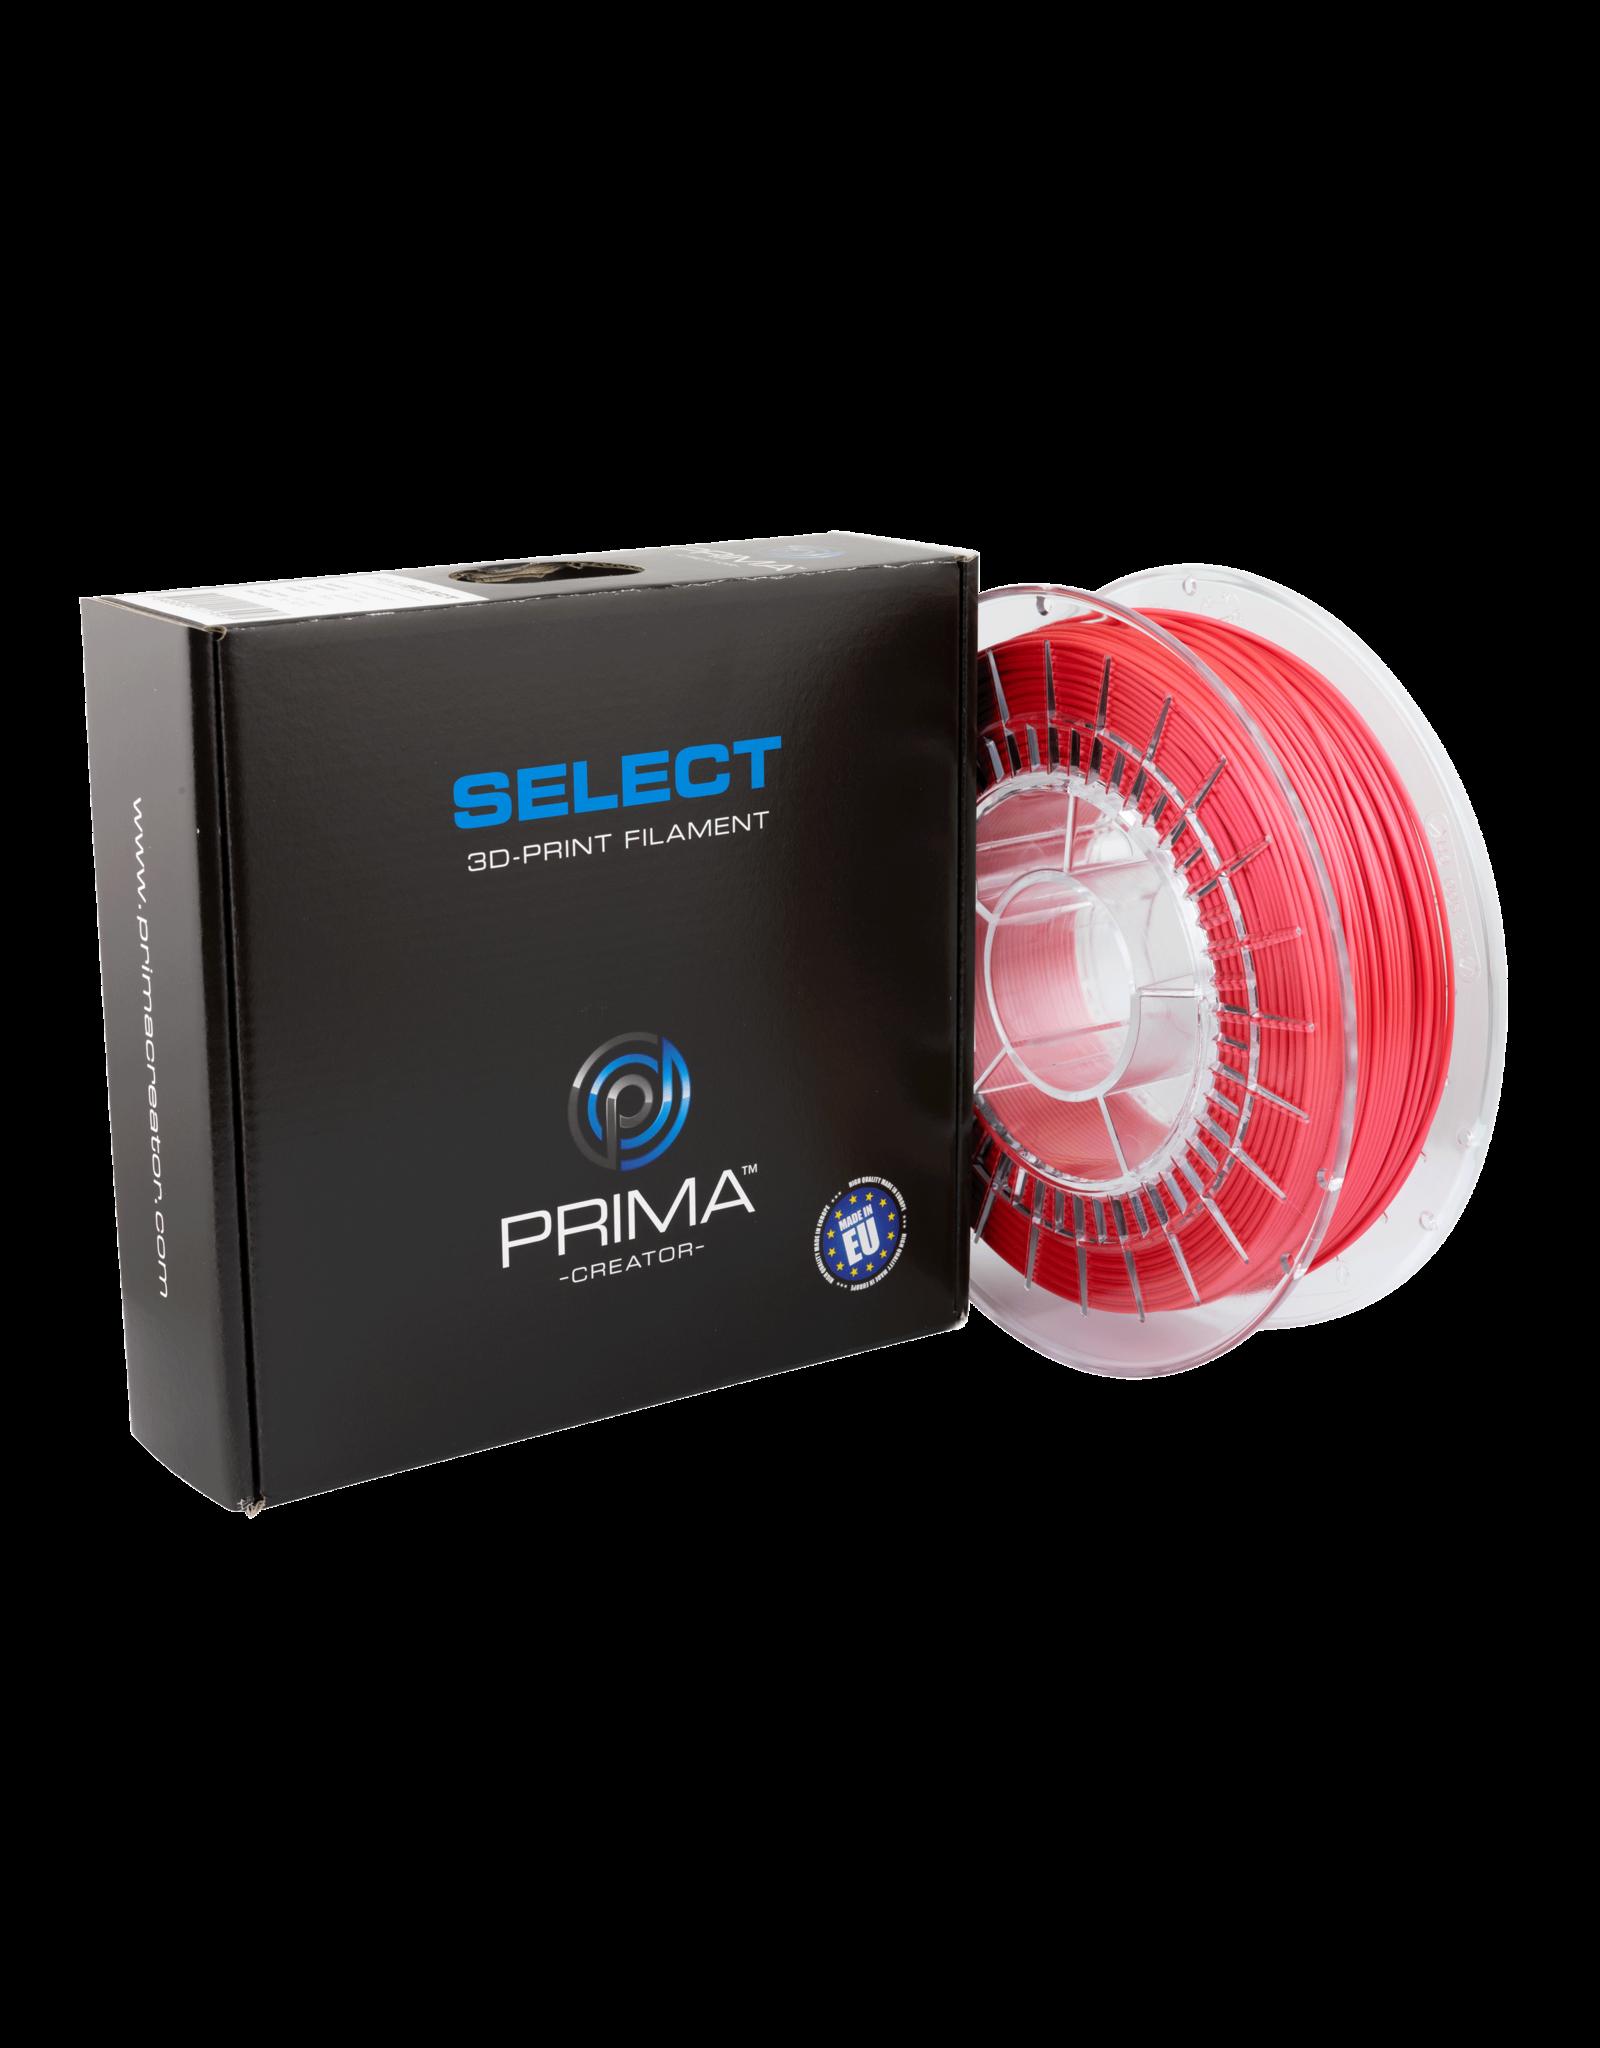 Prima PrimaSelect PLA Glossy - 1.75mm - 750 g - Rouge Chopstick